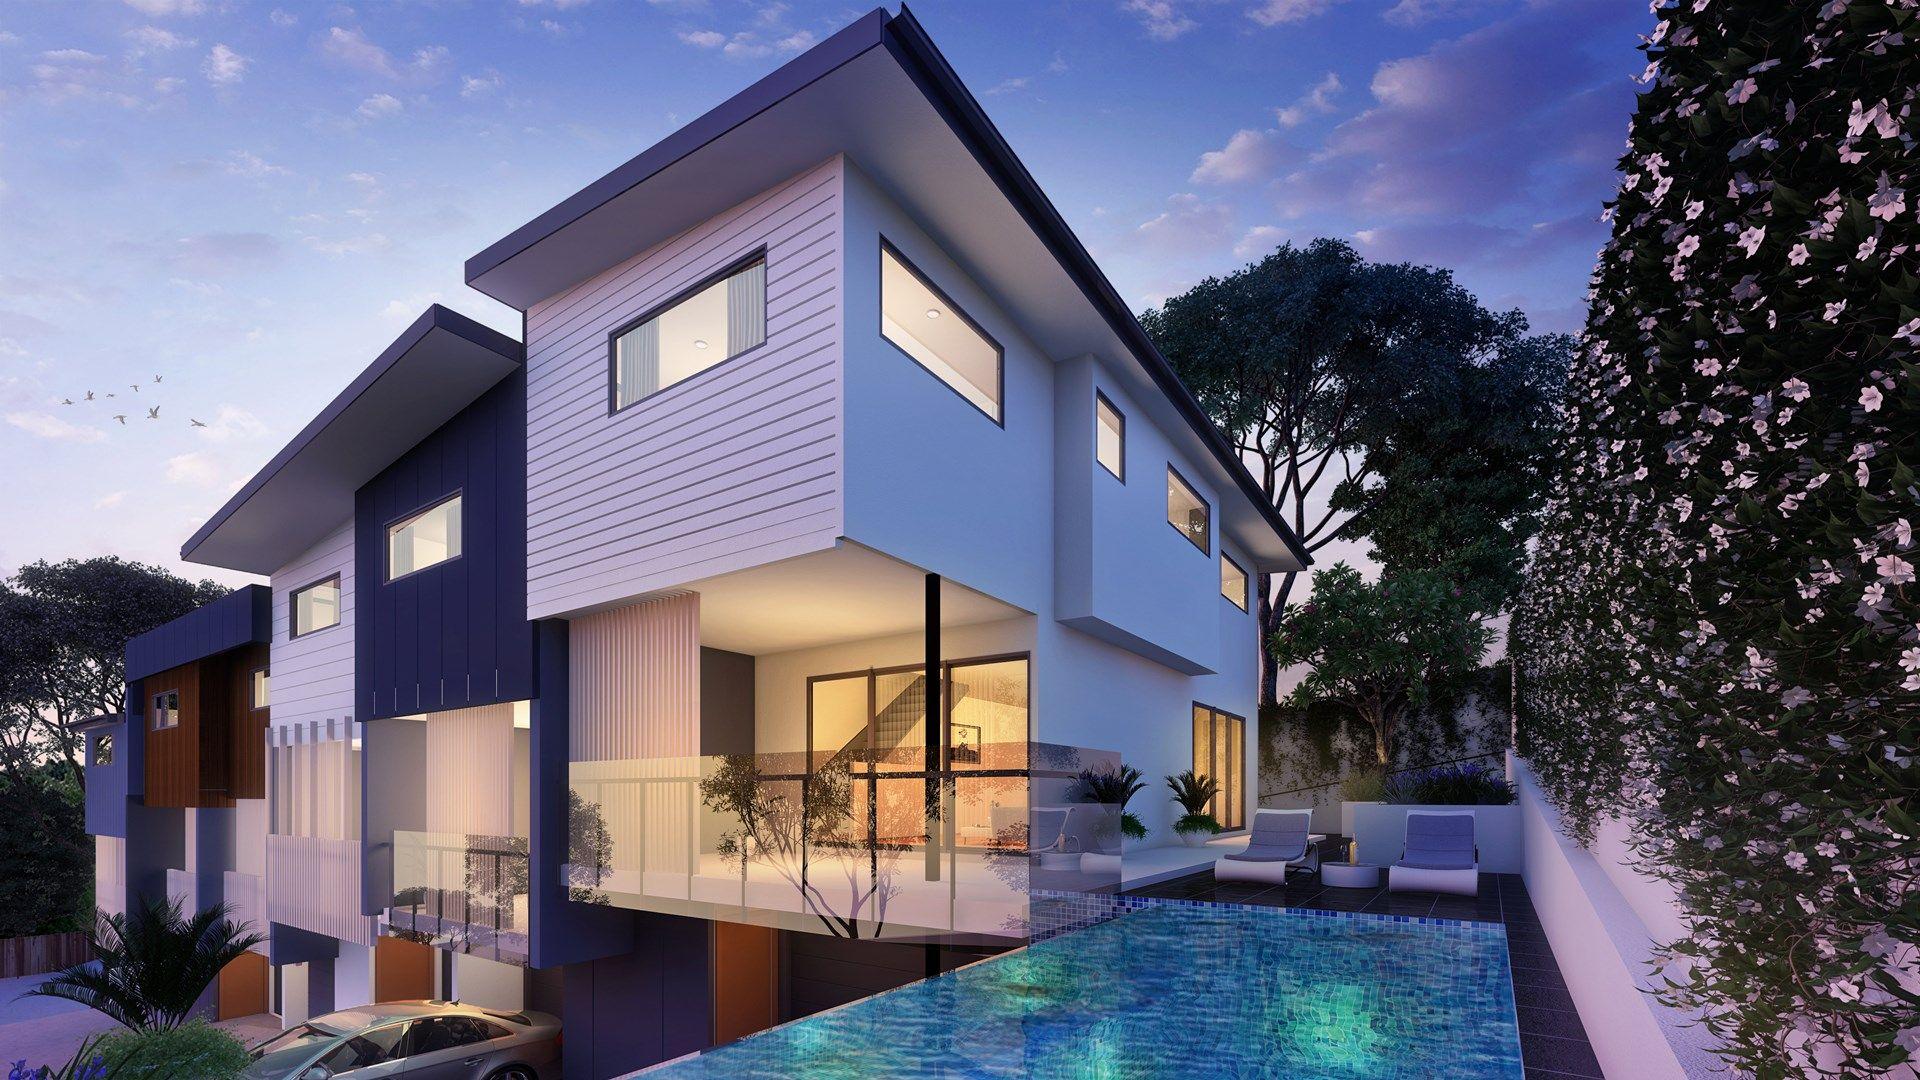 25 Horsington Street, Morningside, QLD 4170, Image 0